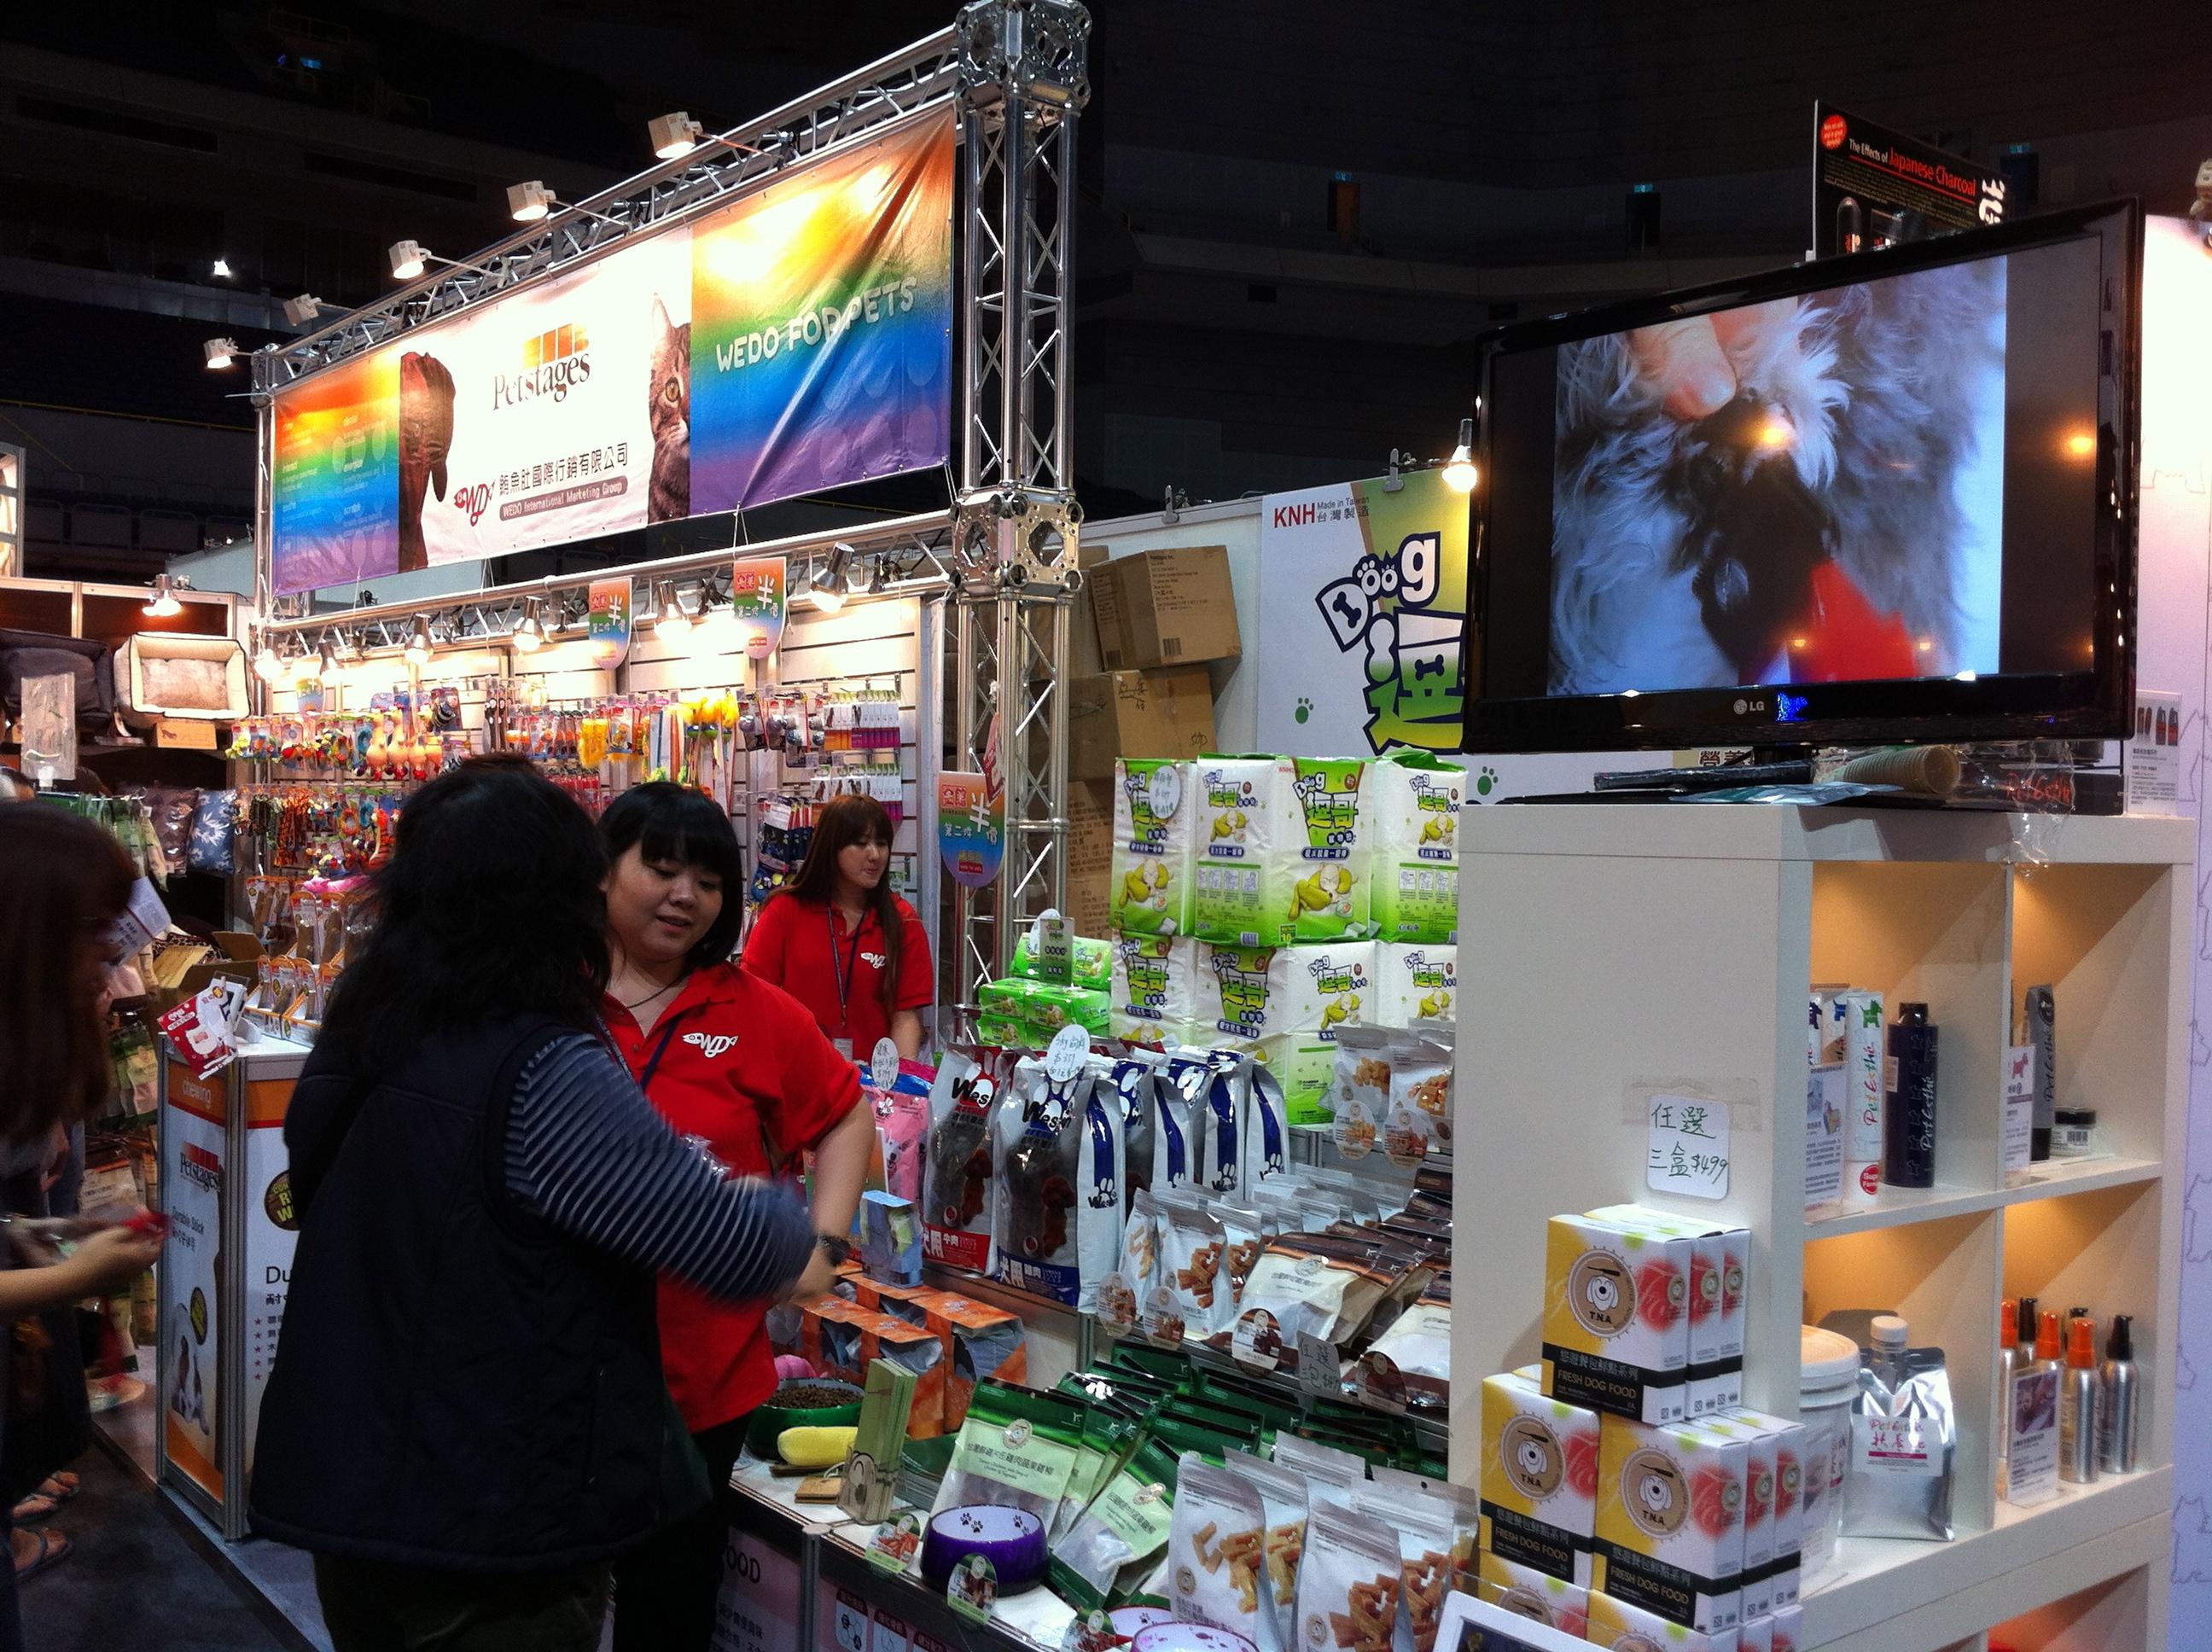 第七屆高雄寵物用品展(2012/12/21-24) – Wedo For Pets